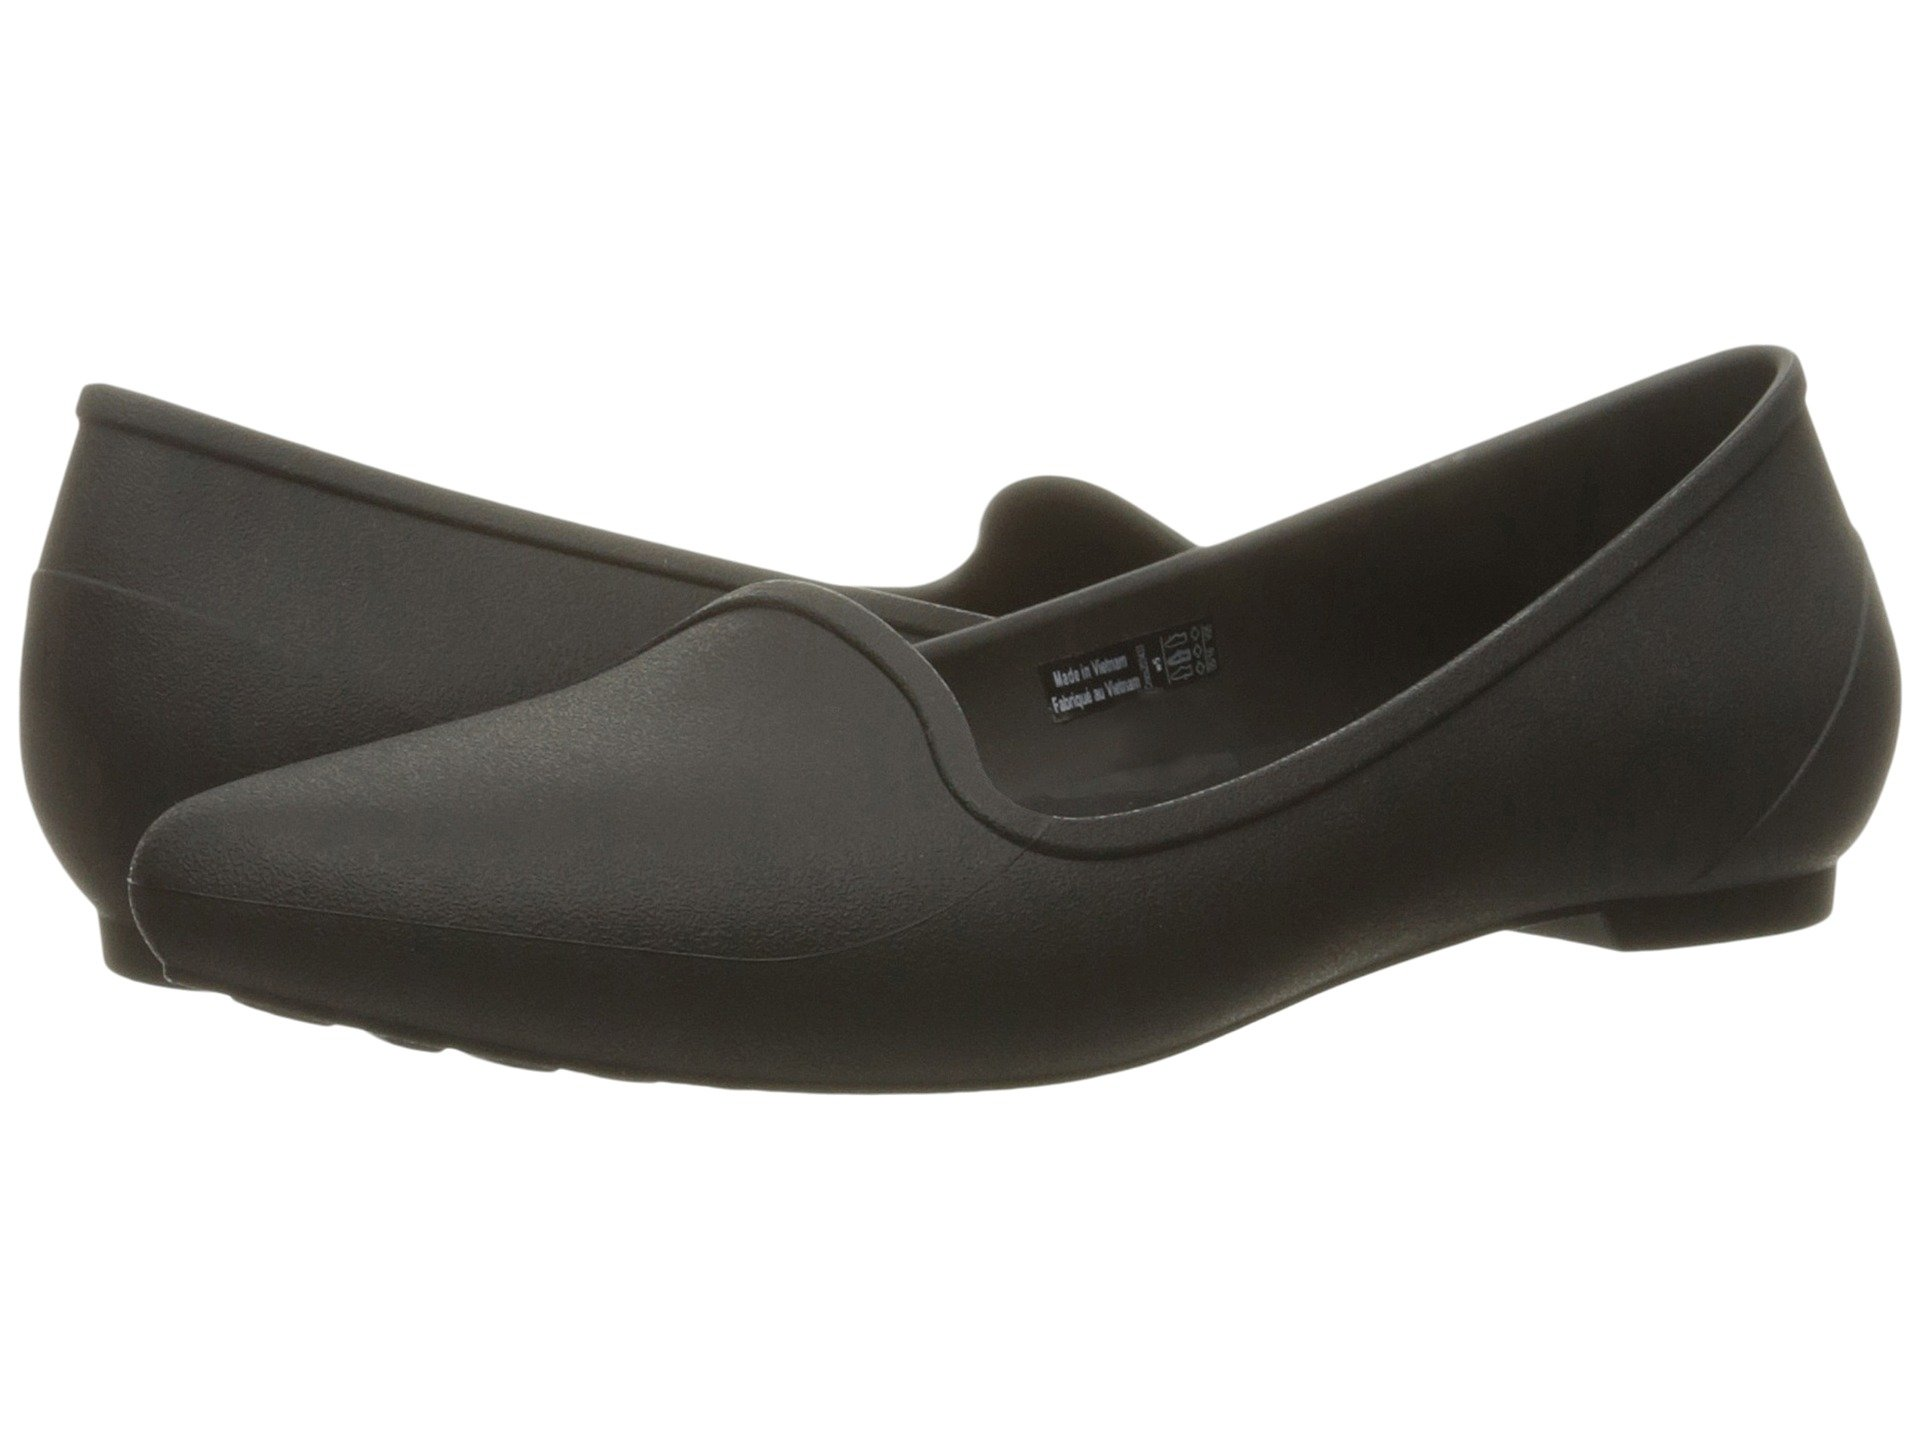 Baletas para Mujer Crocs Eve Flat  + Crocs en VeoyCompro.net